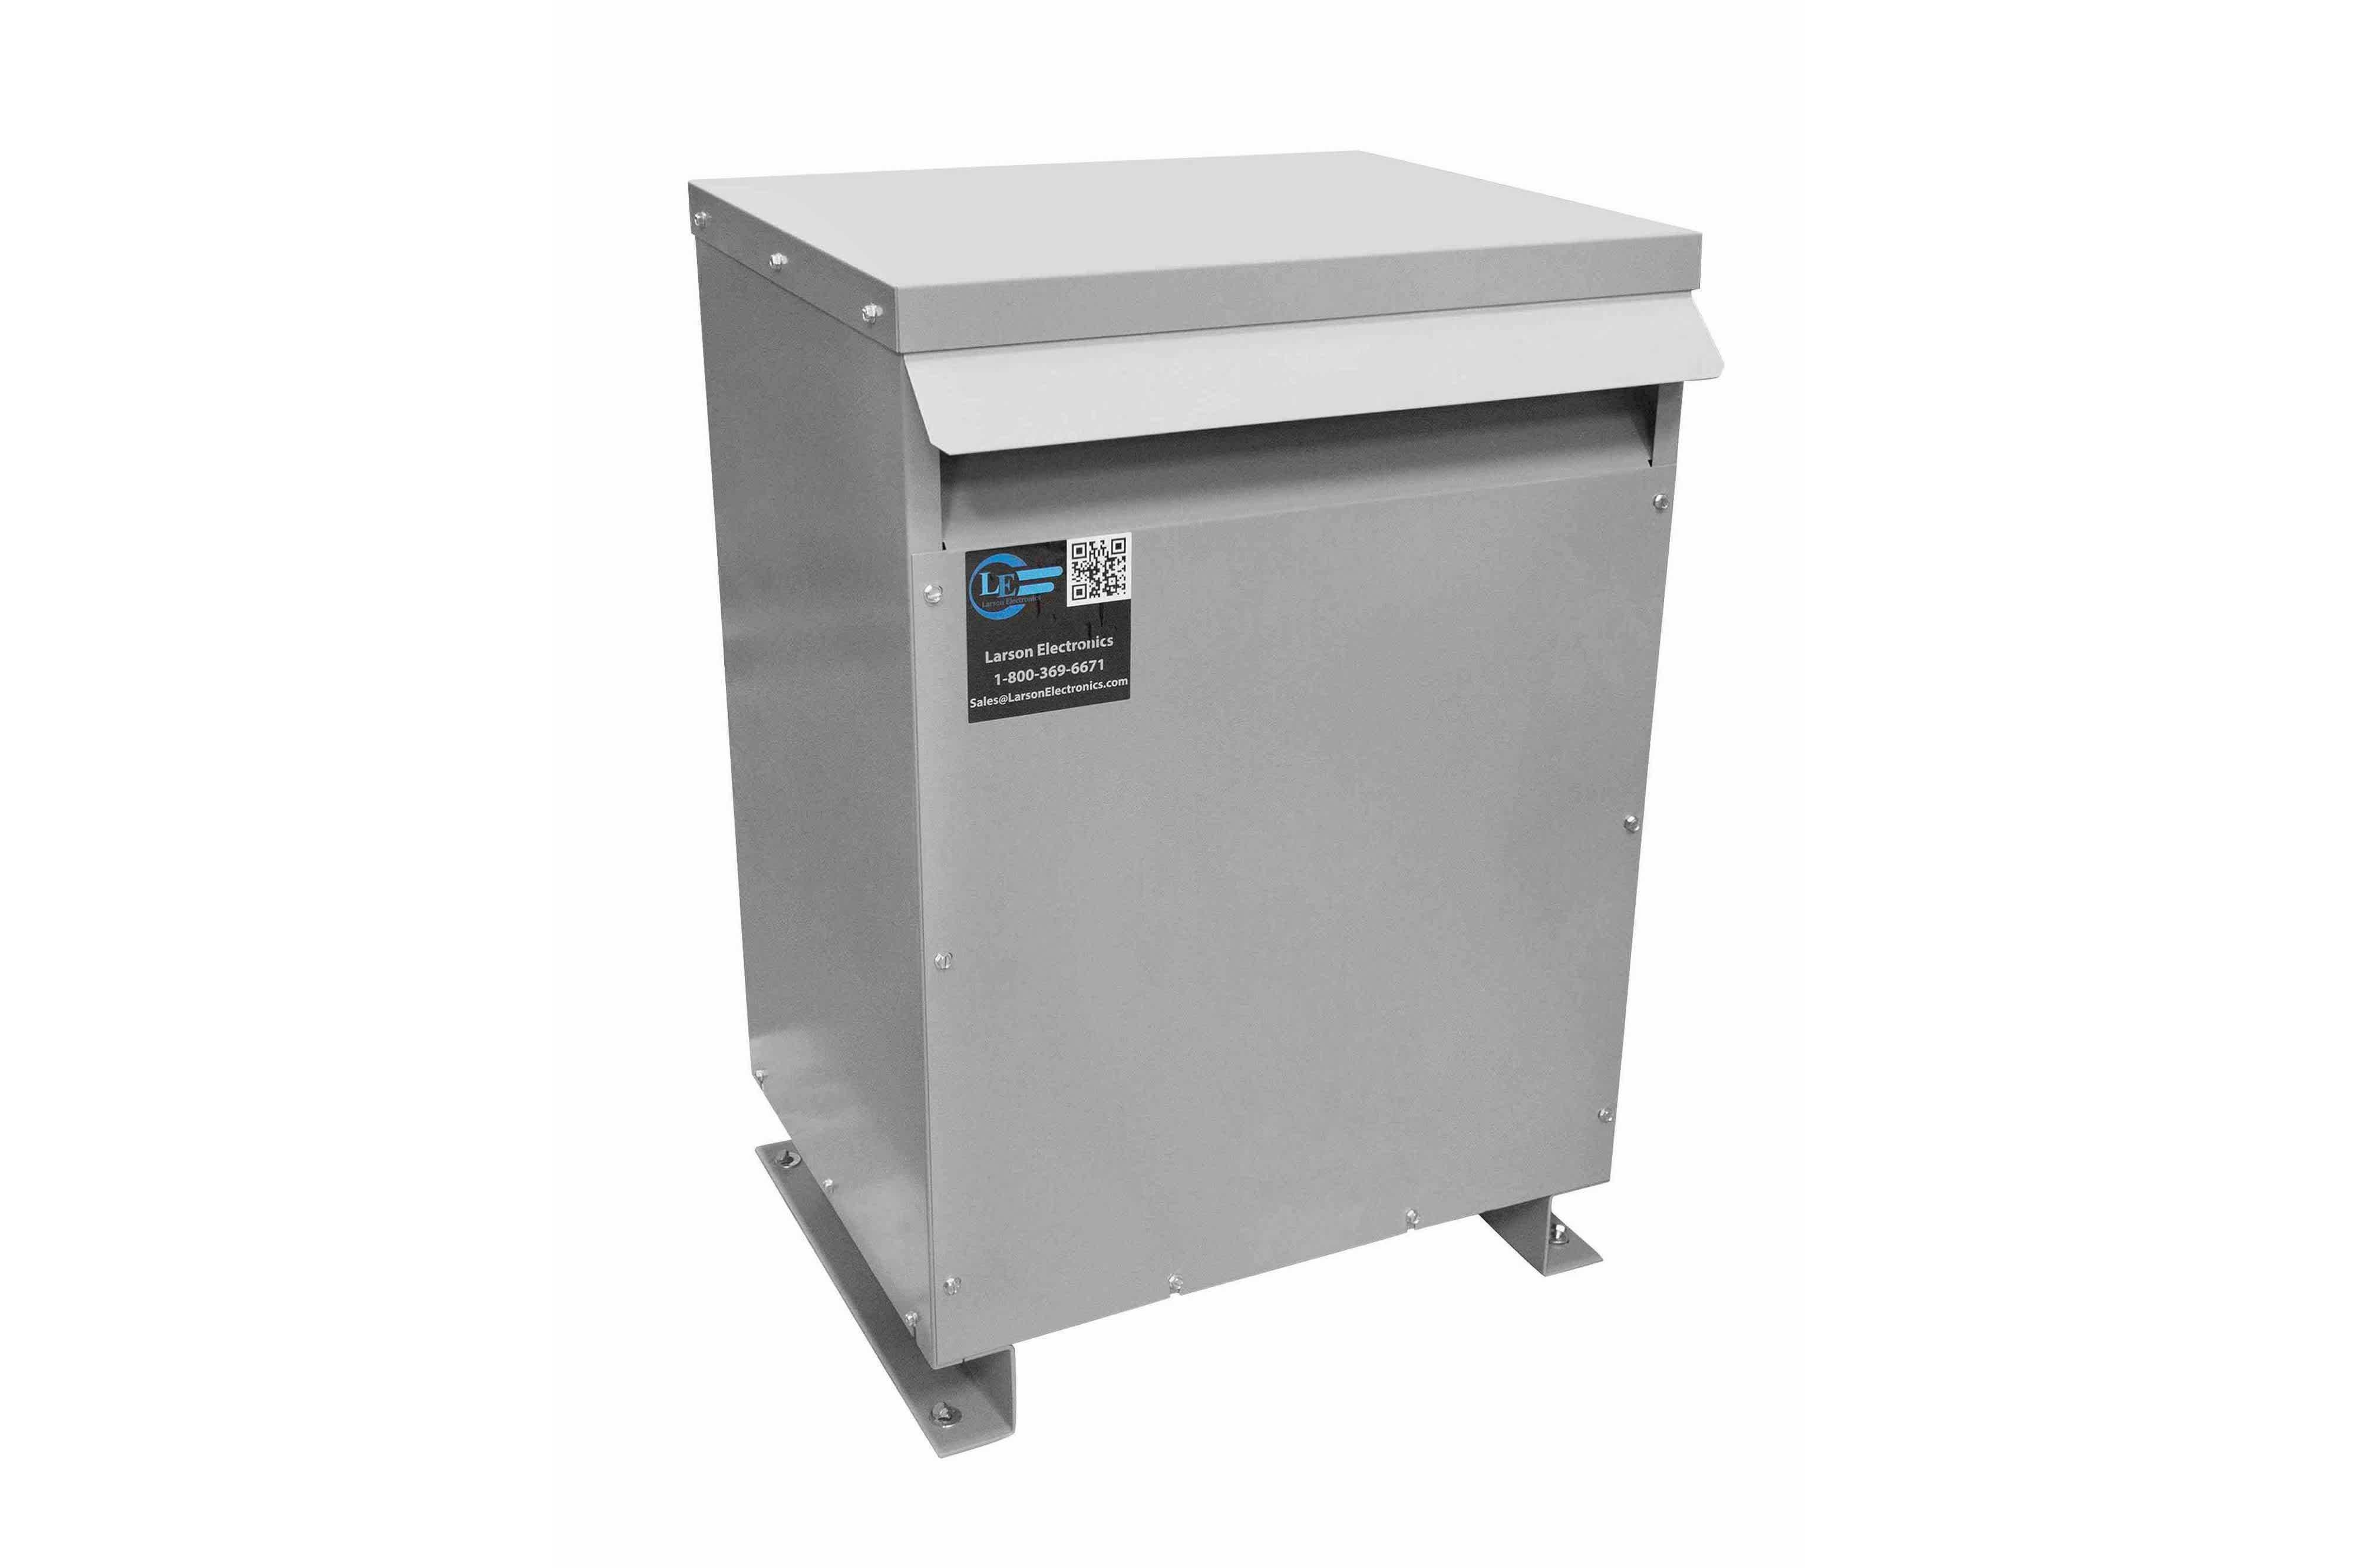 1000 kVA 3PH DOE Transformer, 600V Delta Primary, 415Y/240 Wye-N Secondary, N3R, Ventilated, 60 Hz